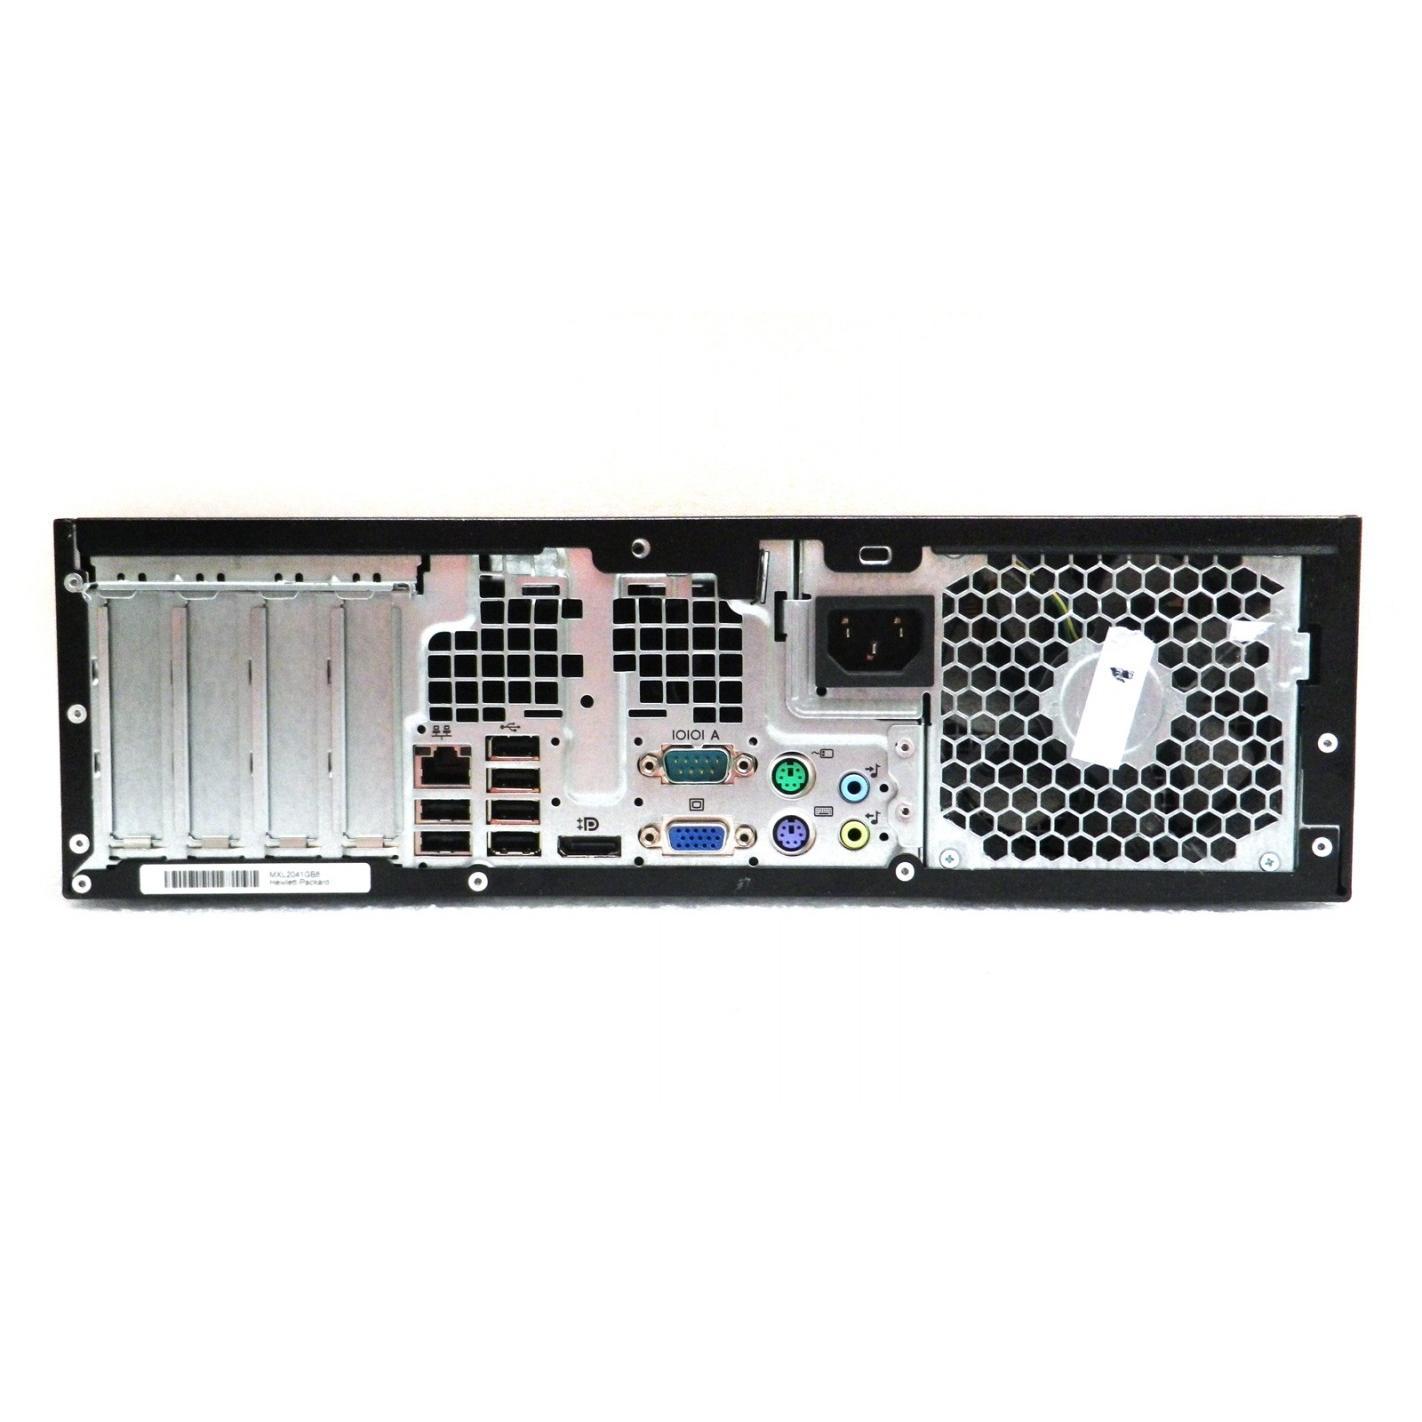 HP Compaq Elite 8200 SFF Core i3-2120 3,3 - HDD 250 GB - 4GB